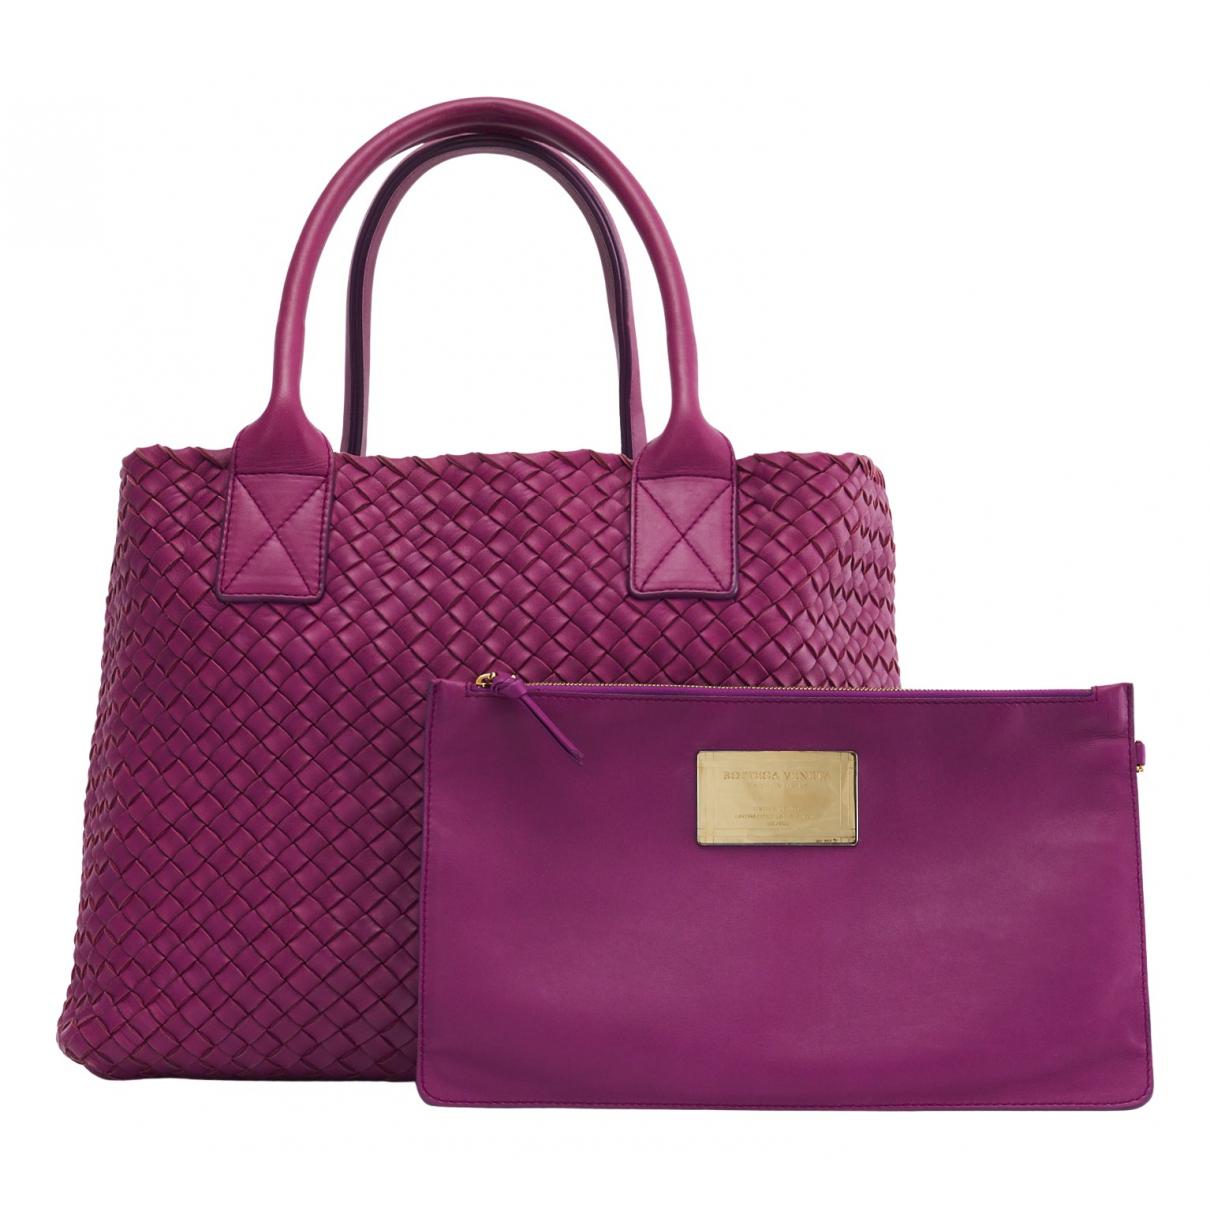 Bottega Veneta Cabat Purple Leather handbag for Women N